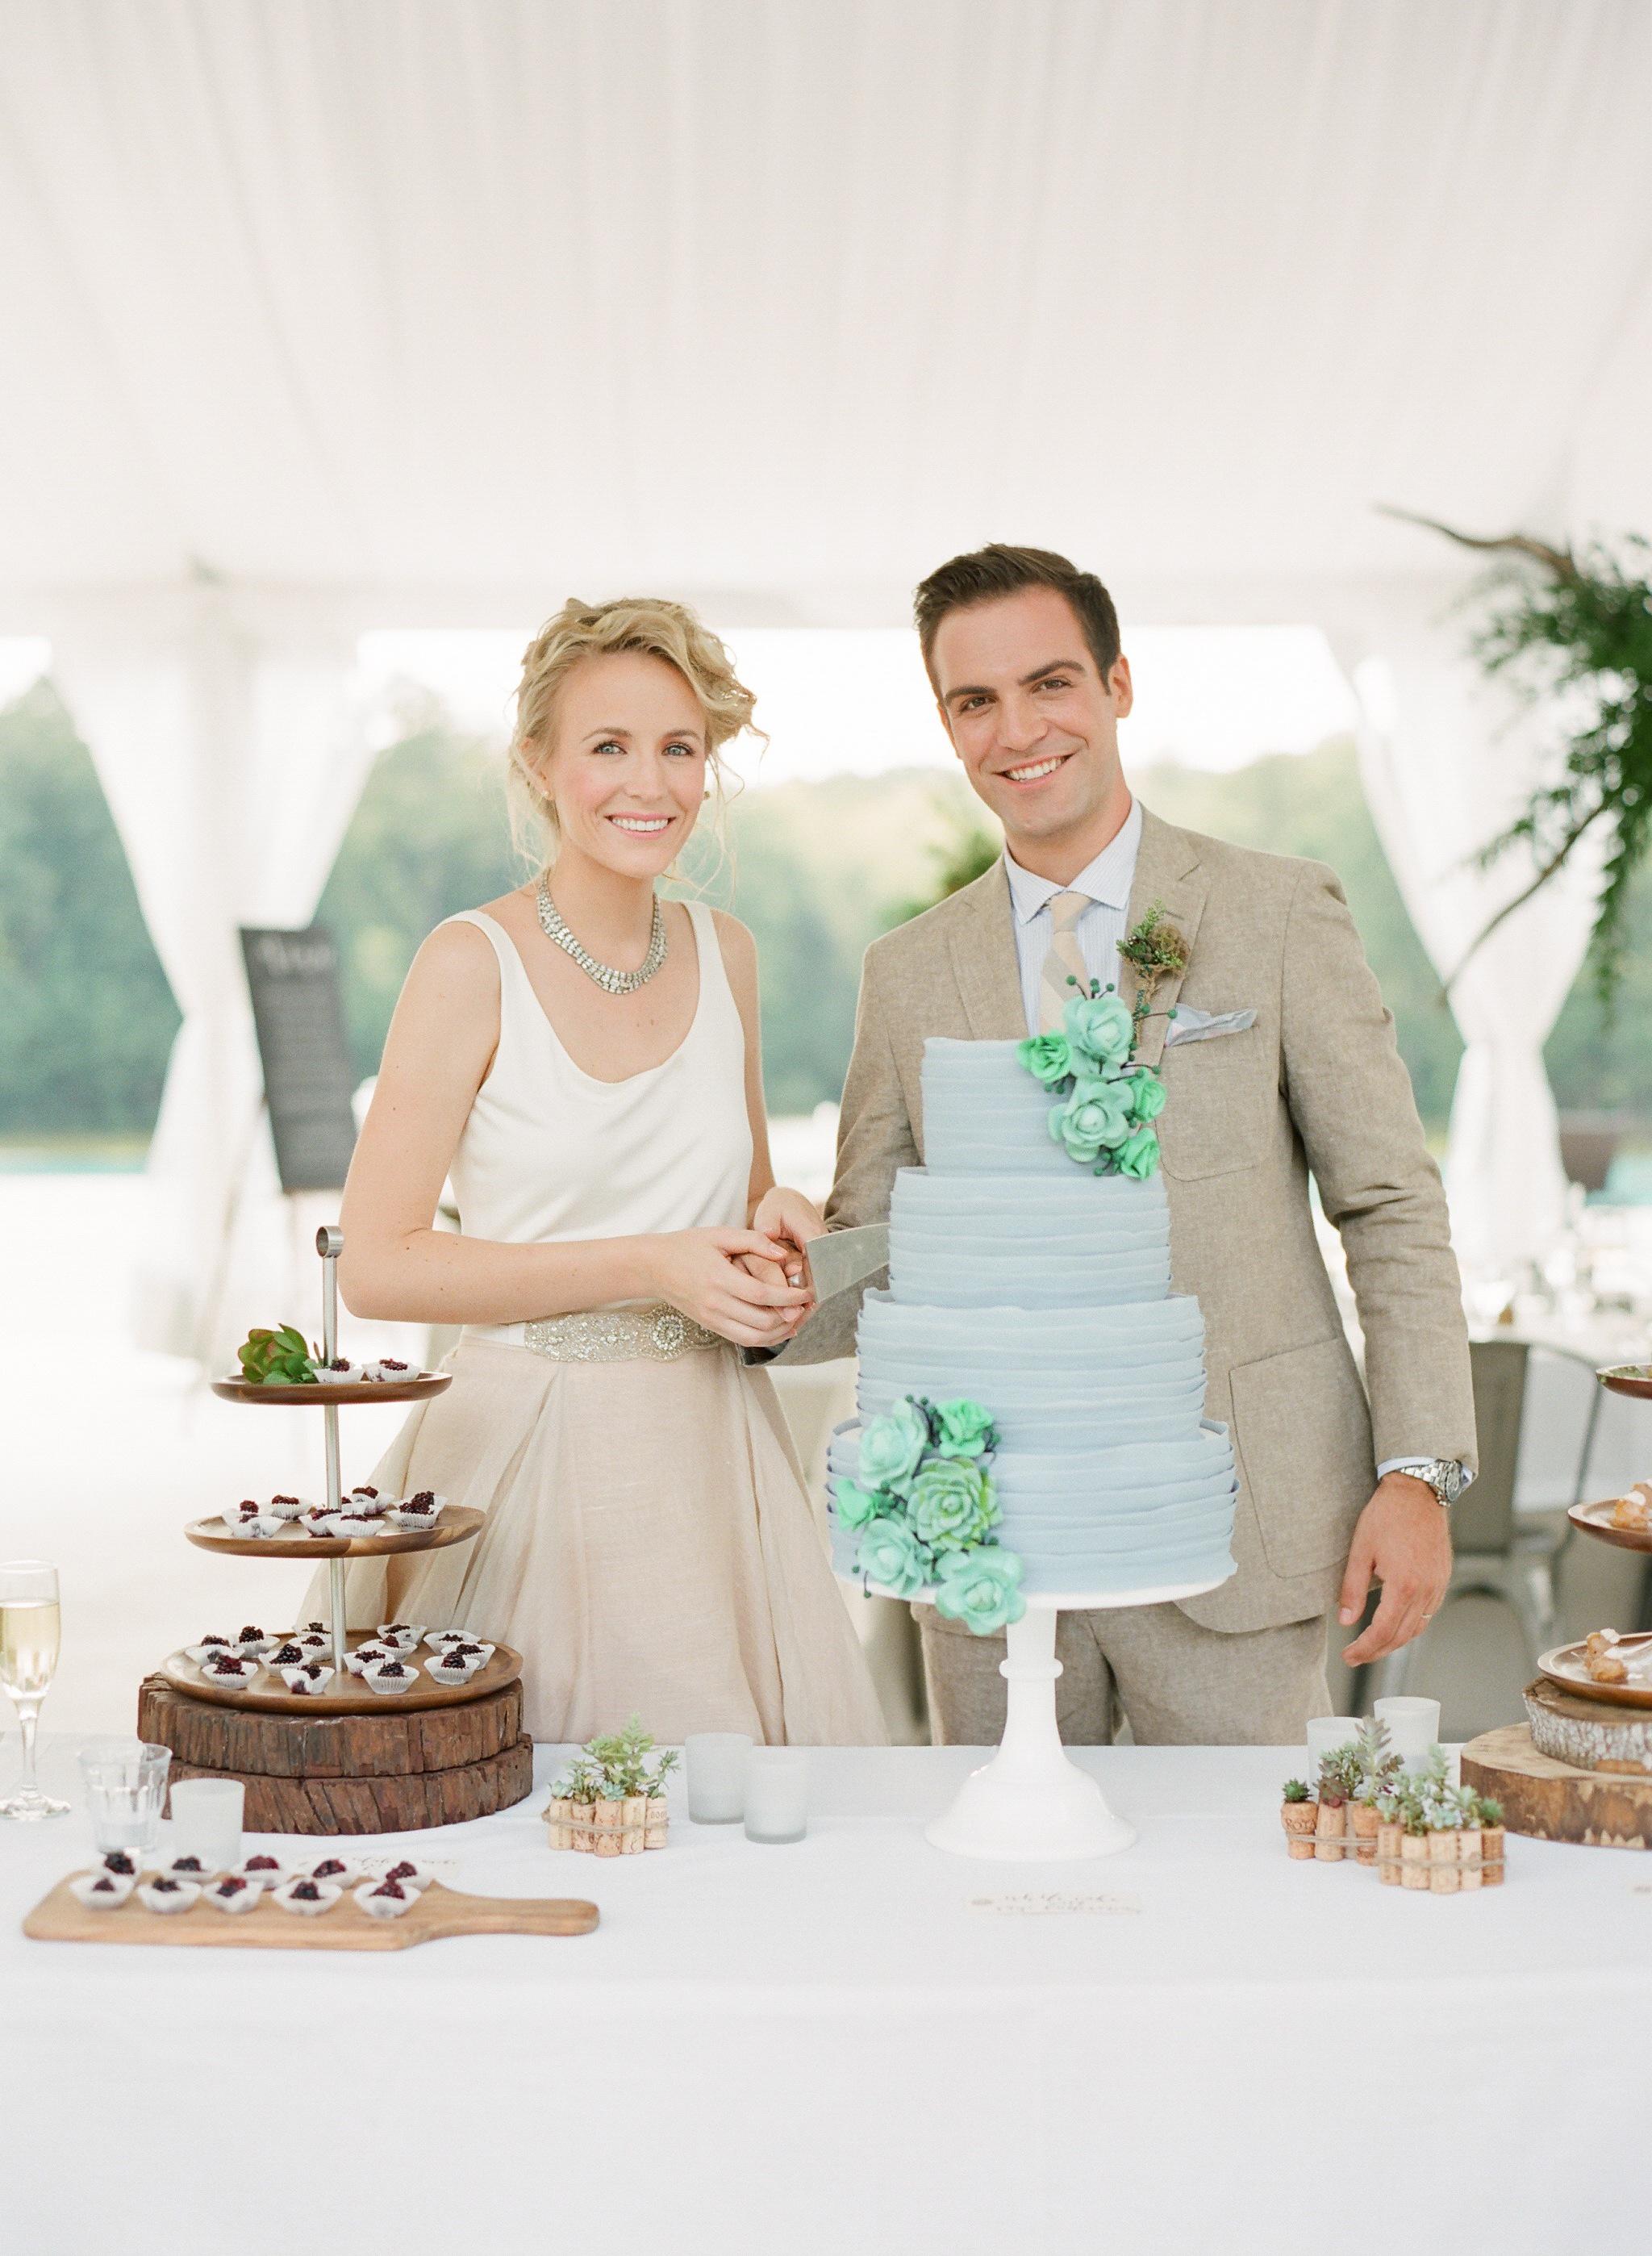 Simply-Charming-Socials_Atlanta-Wedding-Planner_Styled-Photo-Shoot_Modern-Luxury-Brides_Buffy-Dekmar-Photography_Ginny-Branch_Foxhall-Sporting-Club_17.jpg